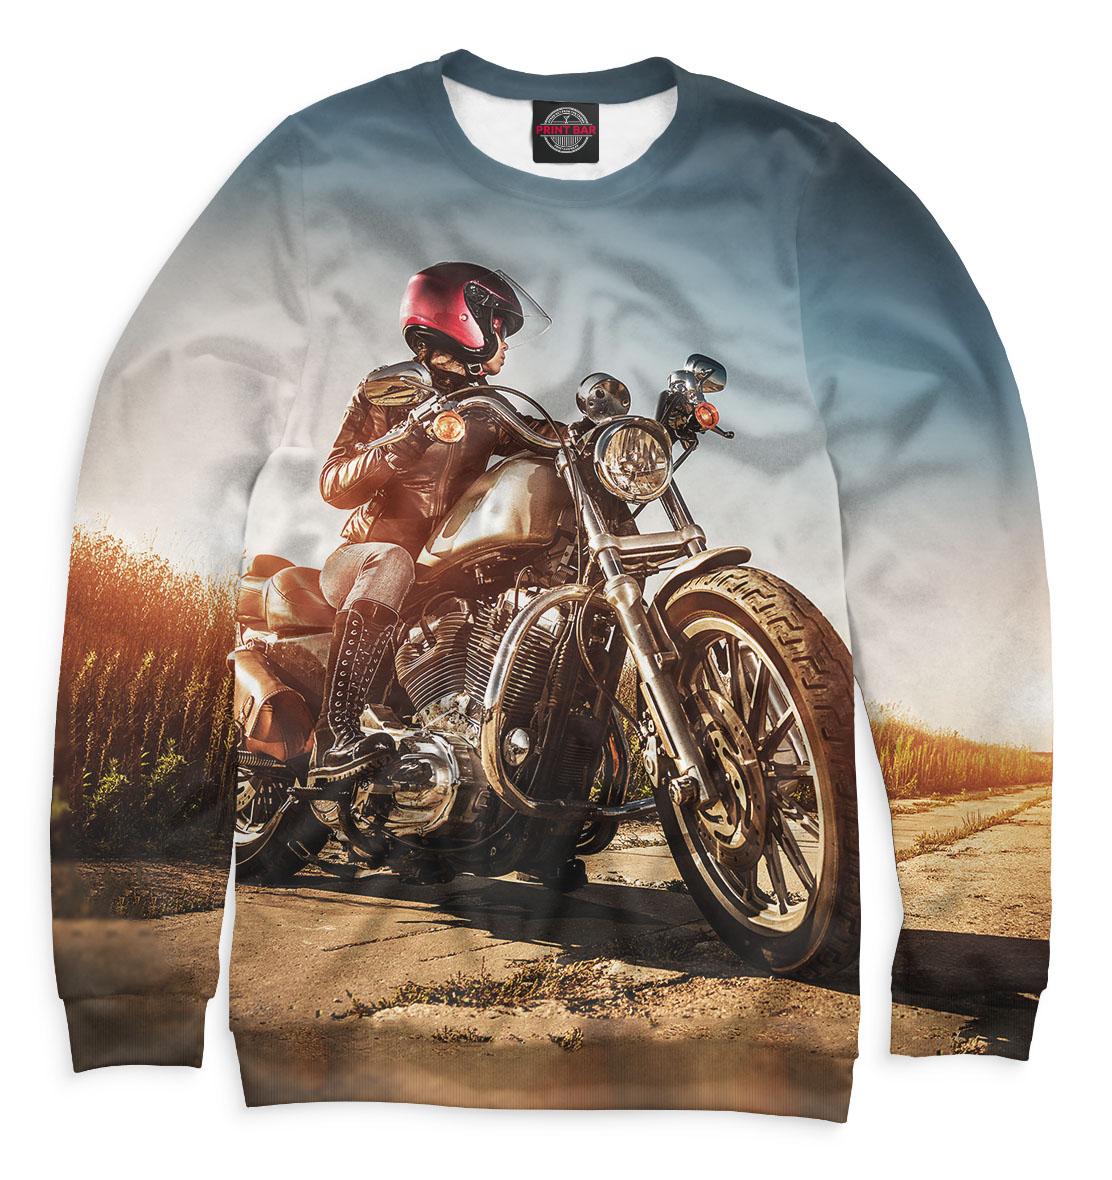 Купить Девушка на мотоцикле, Printbar, Свитшоты, MTR-372509-swi-1